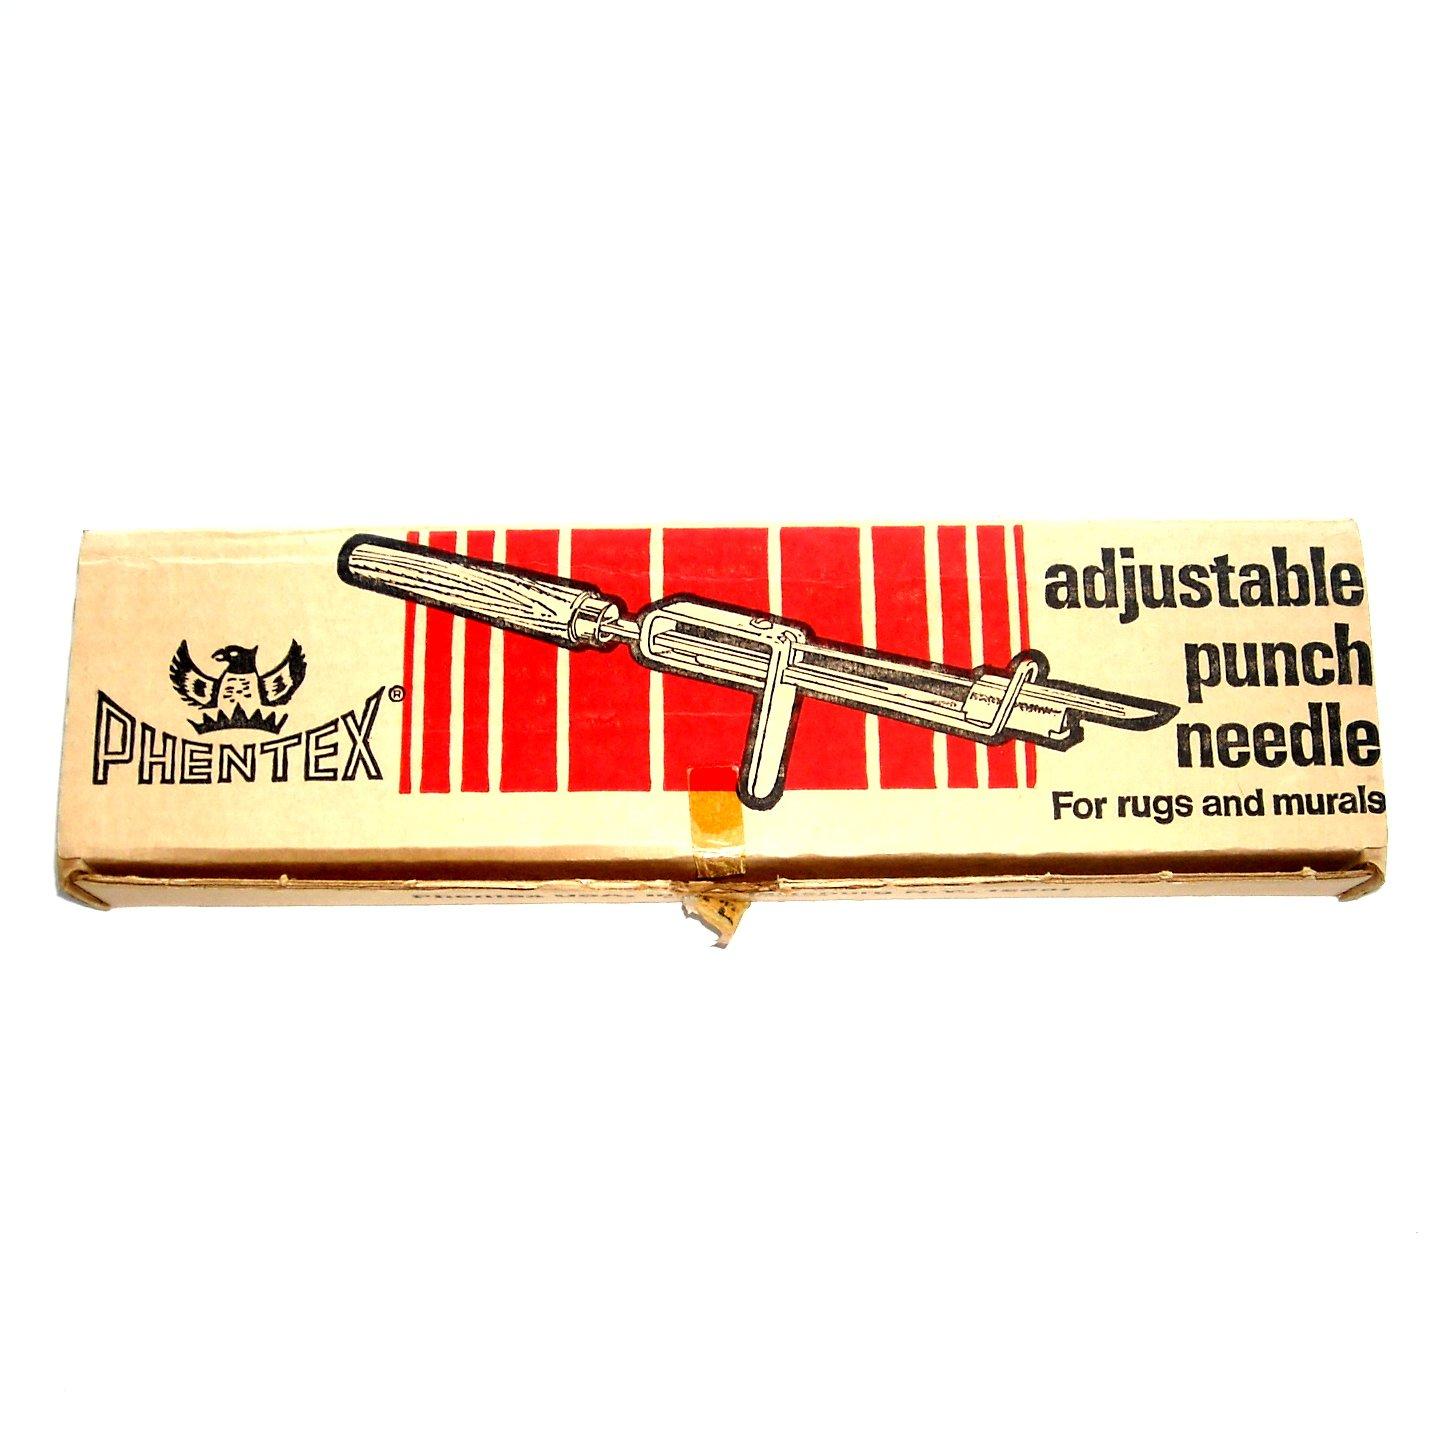 Phentex Rugs Adjustable Punch Needle